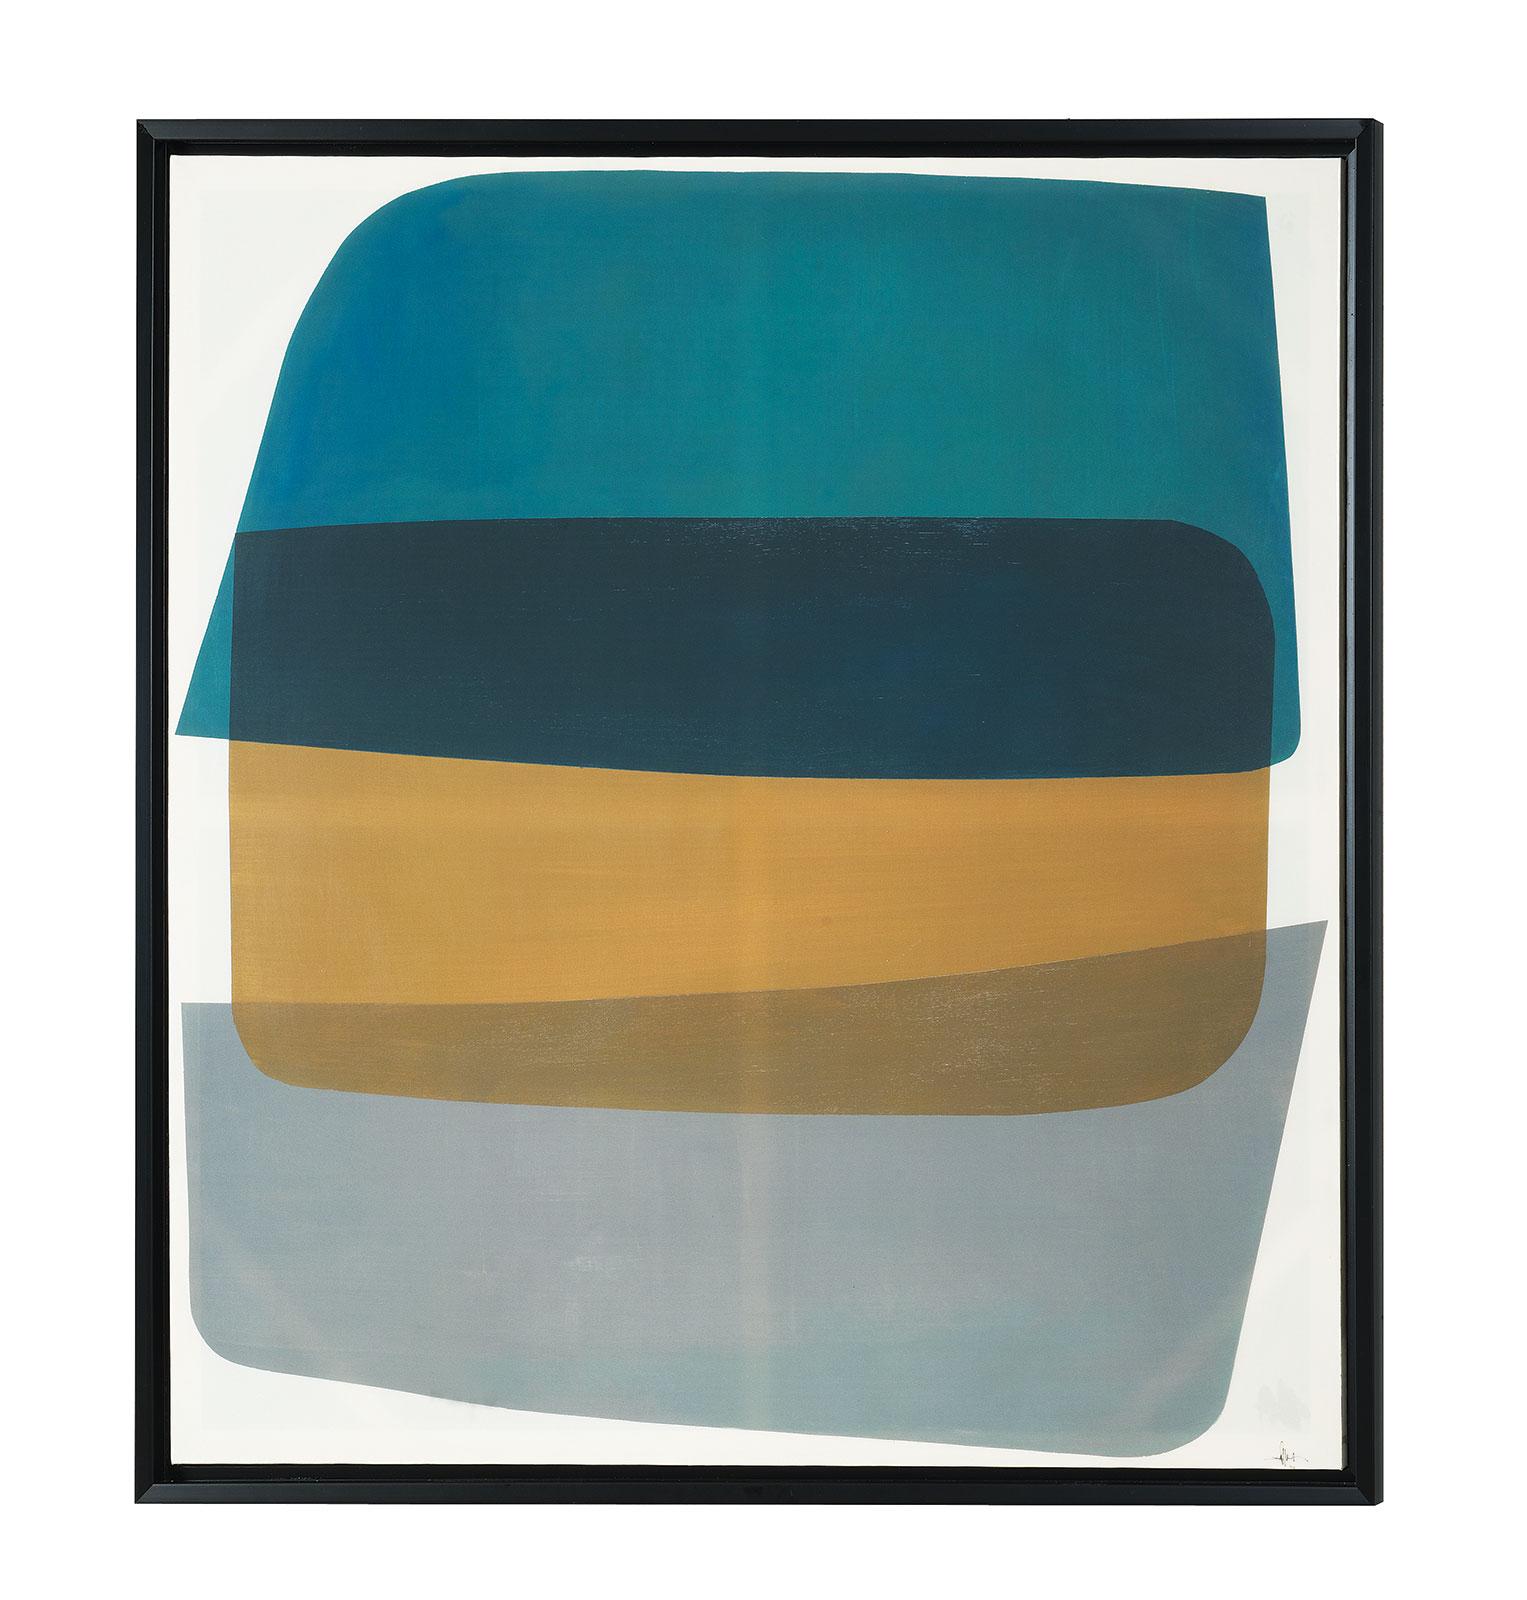 Coaster Wall Art Art - Item Number: 960880